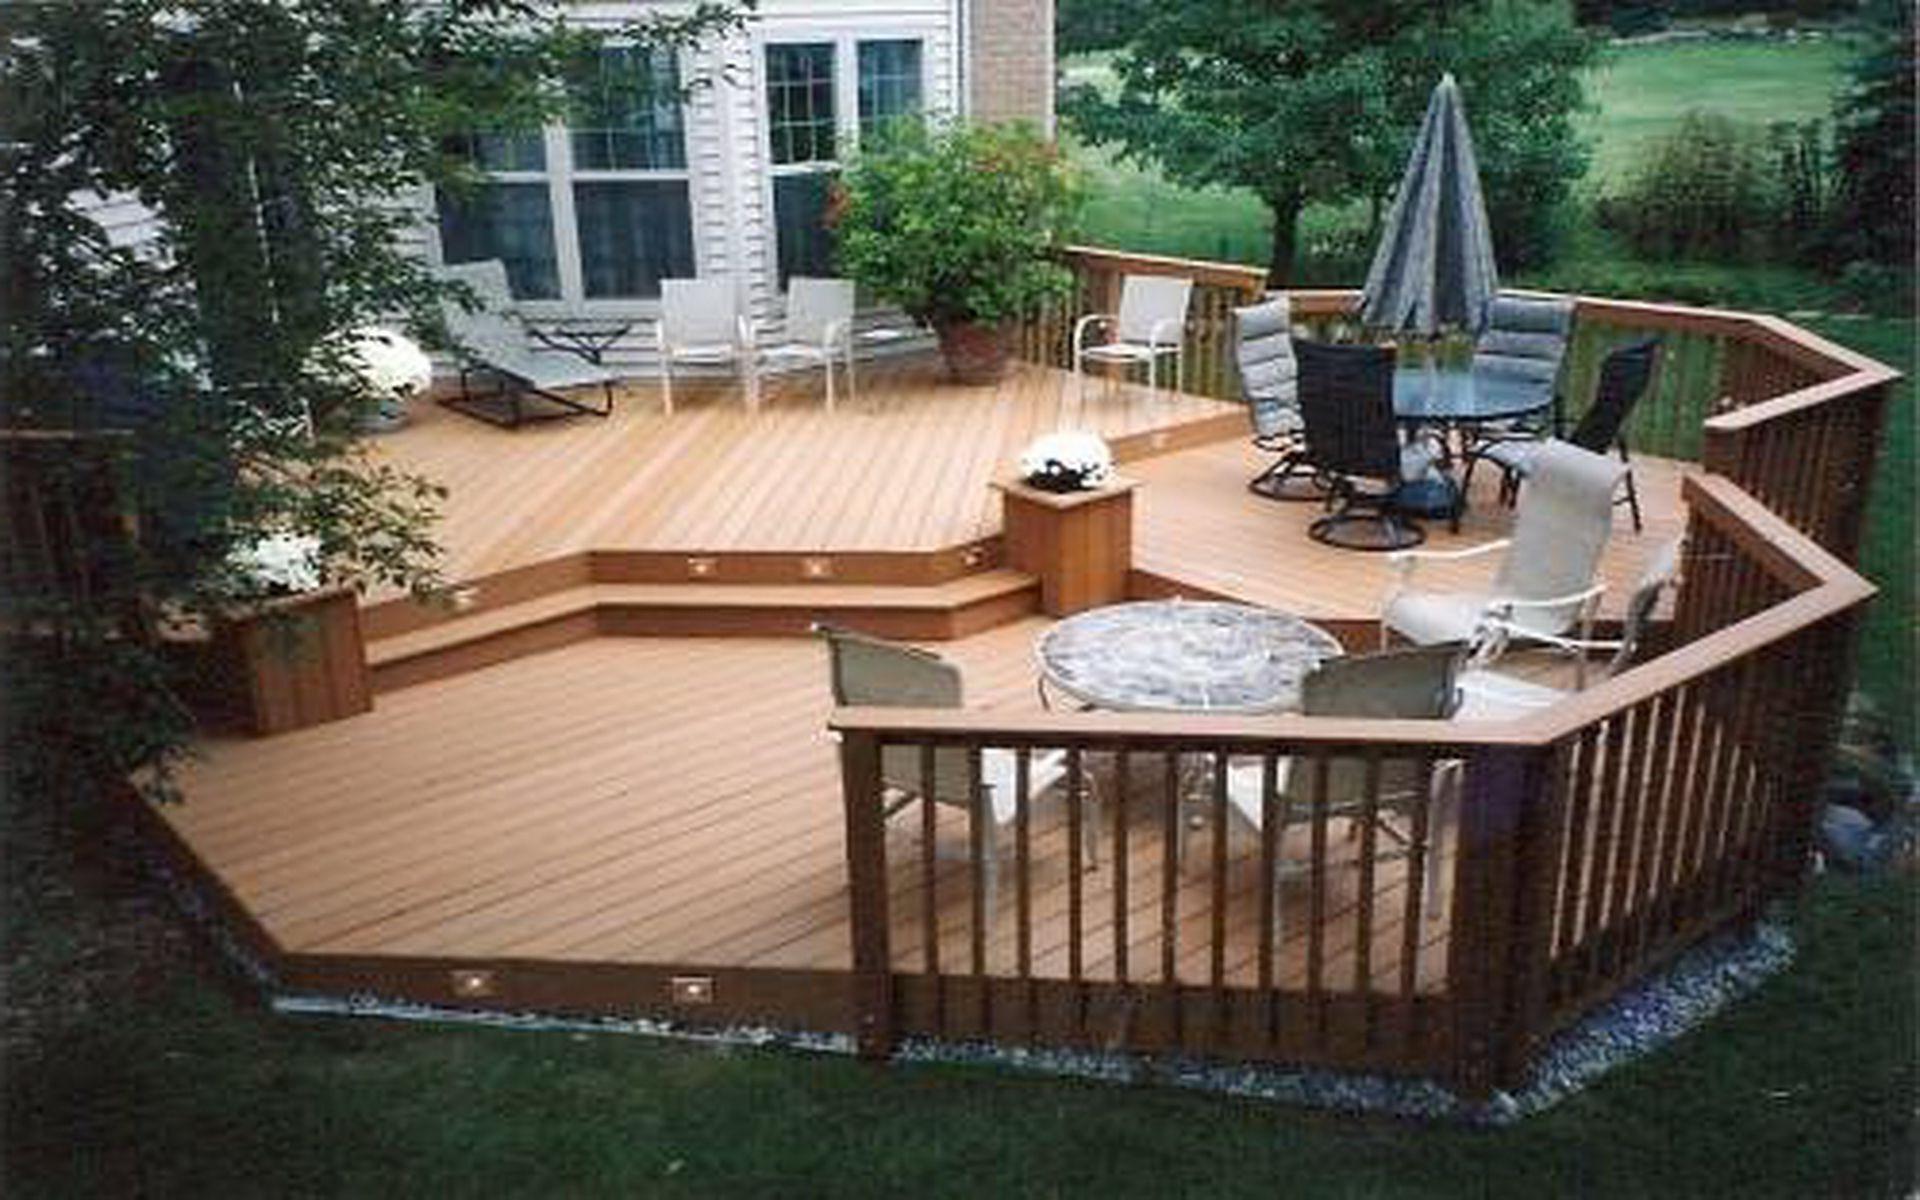 Backyard Deck Plans  11 Genius Ideas How to Makeover Cheap Backyard Deck Ideas